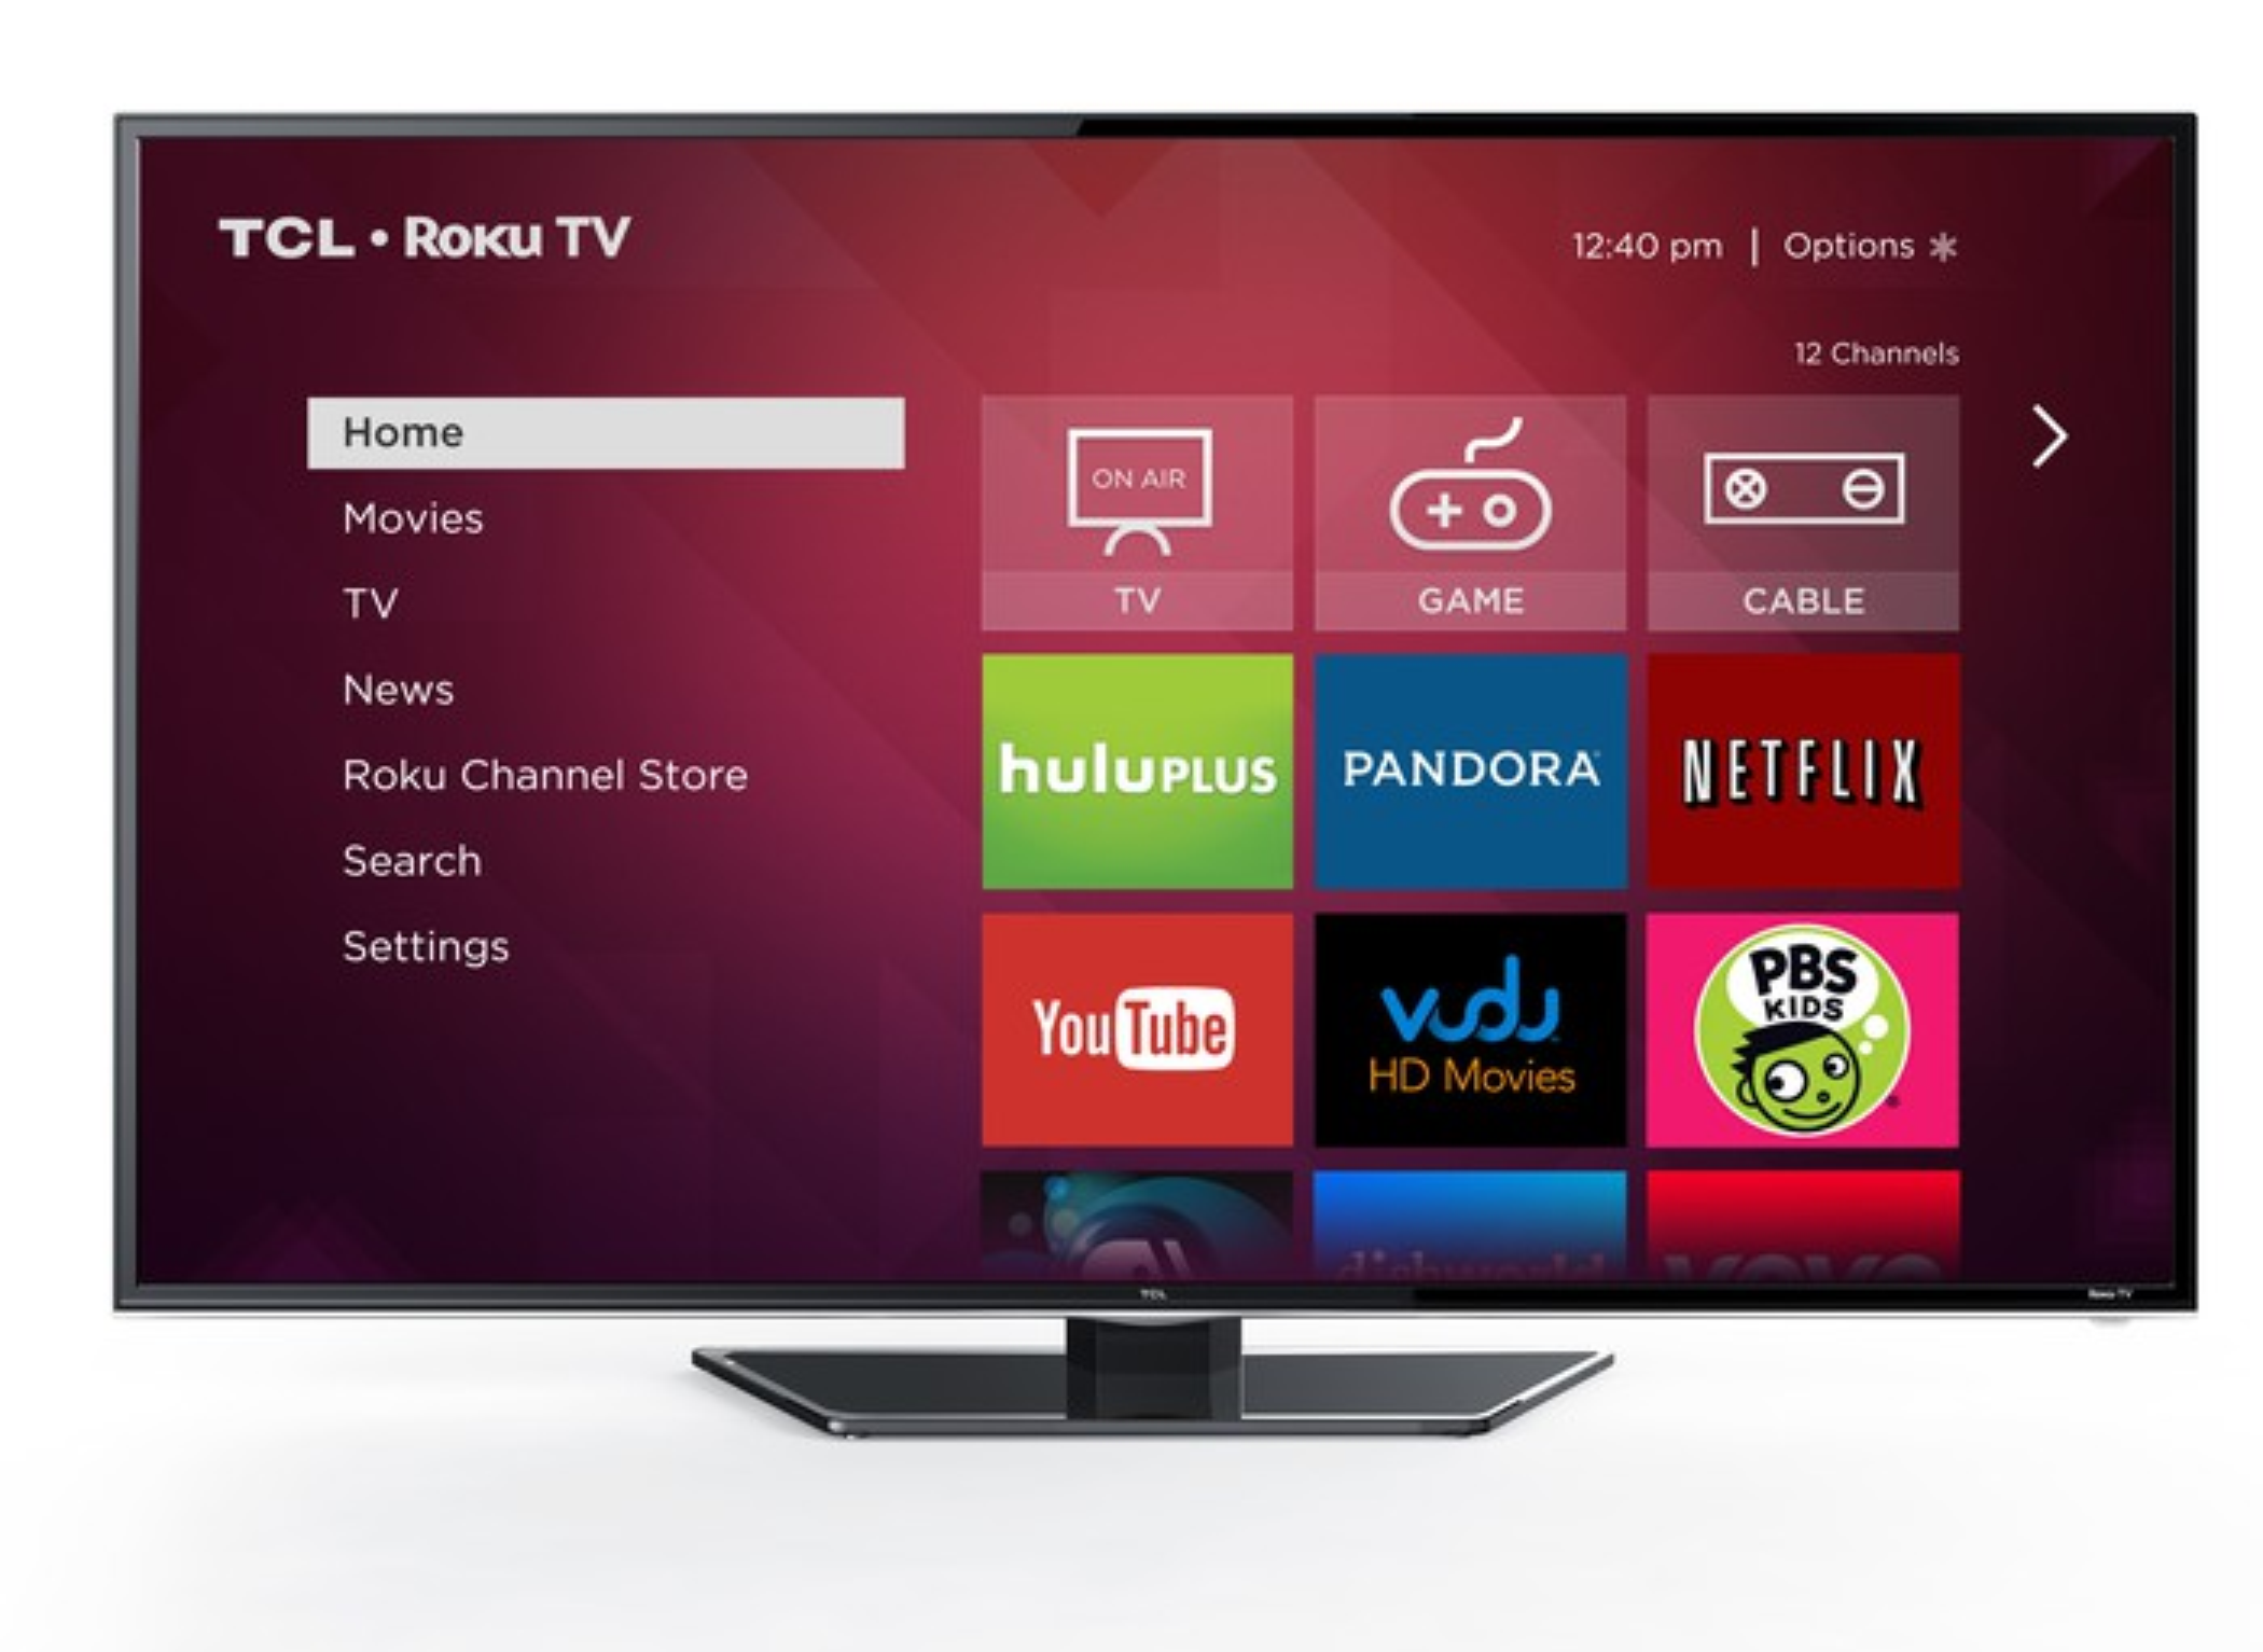 A TCL Roku TV running the Roku app.